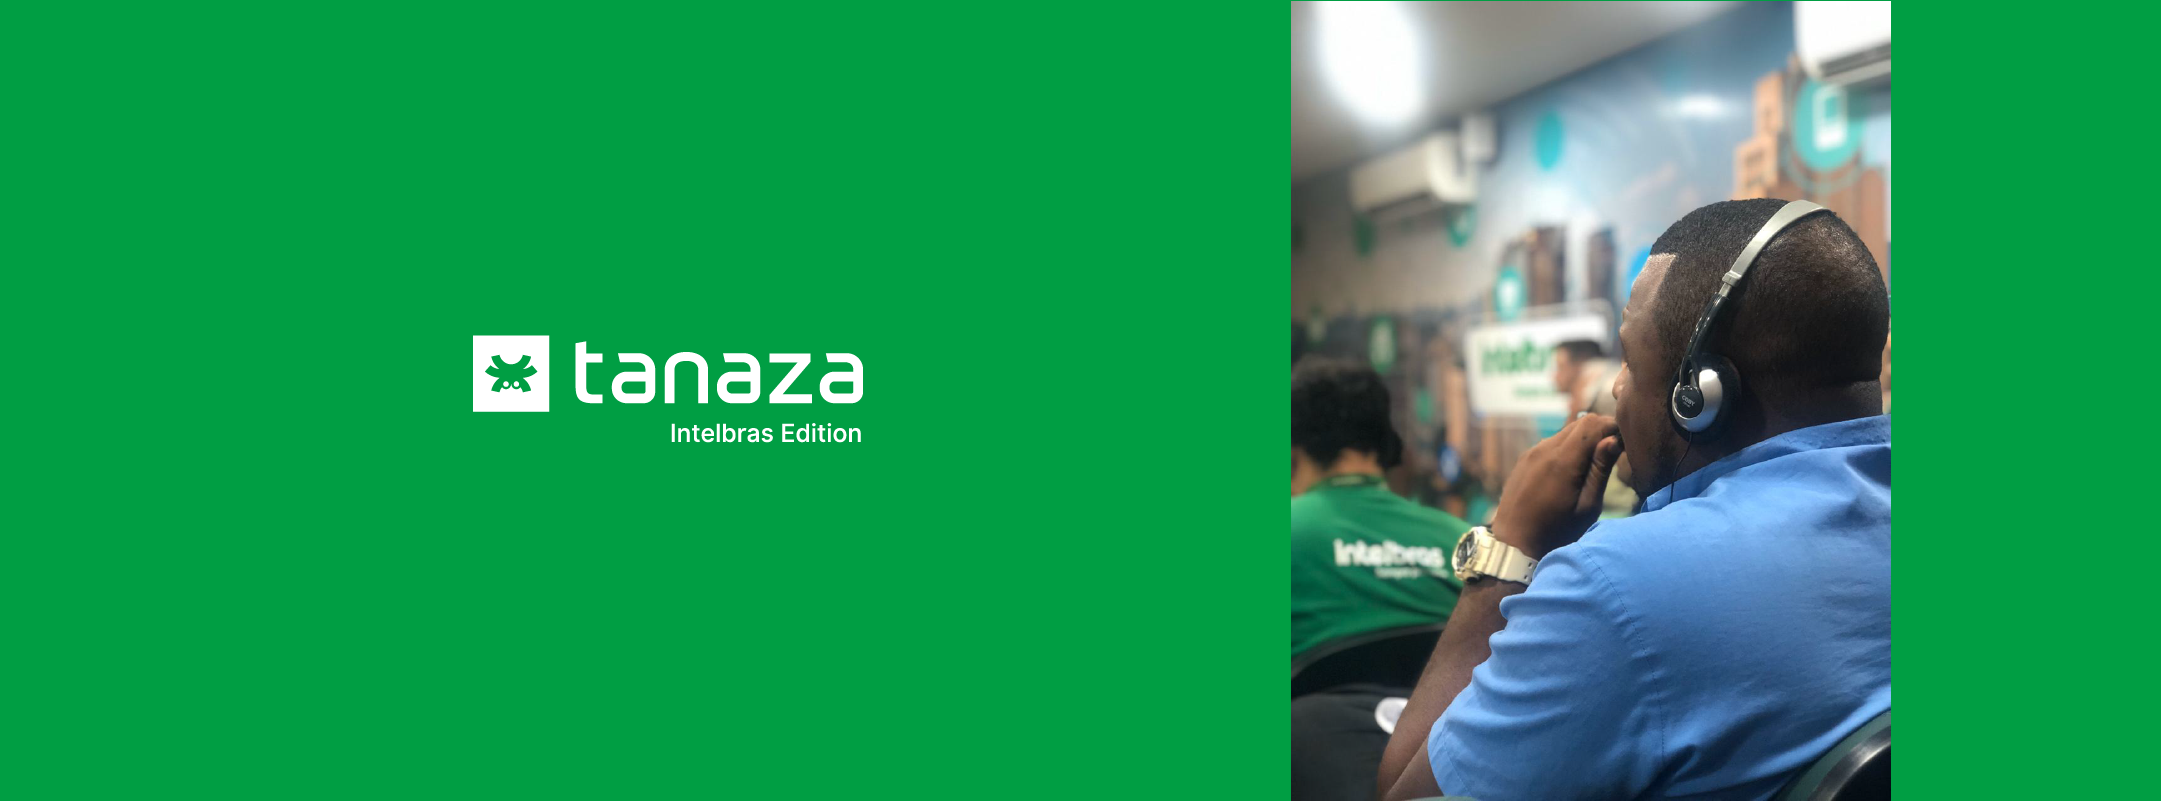 Tanaza Intelbras Edition